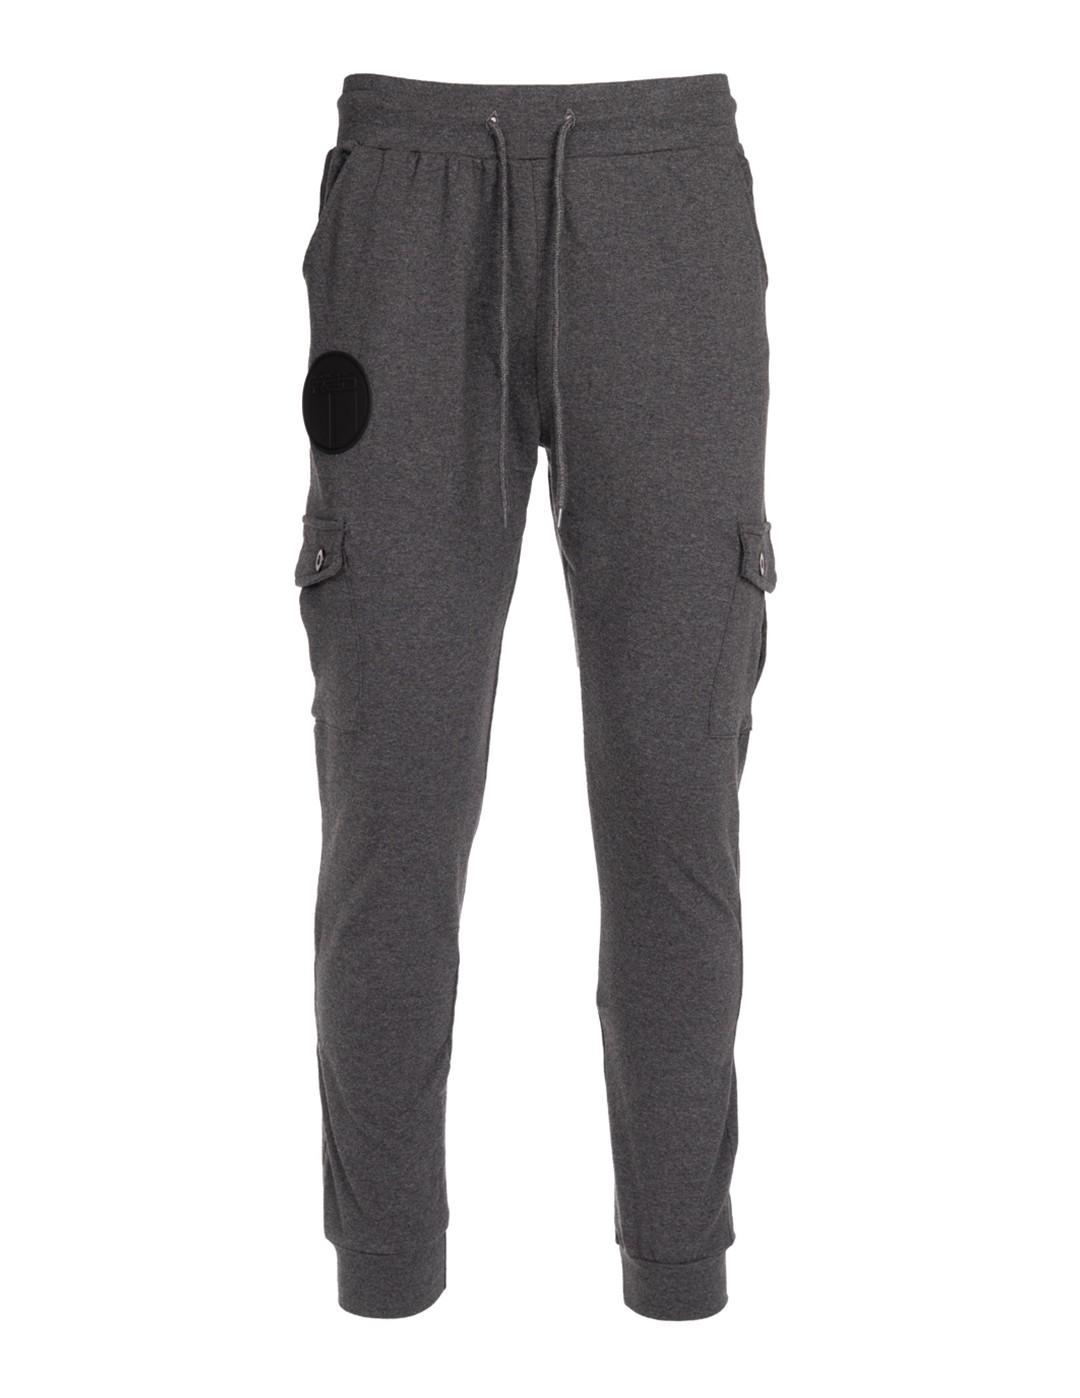 Sweatpants Side Pocket Grey